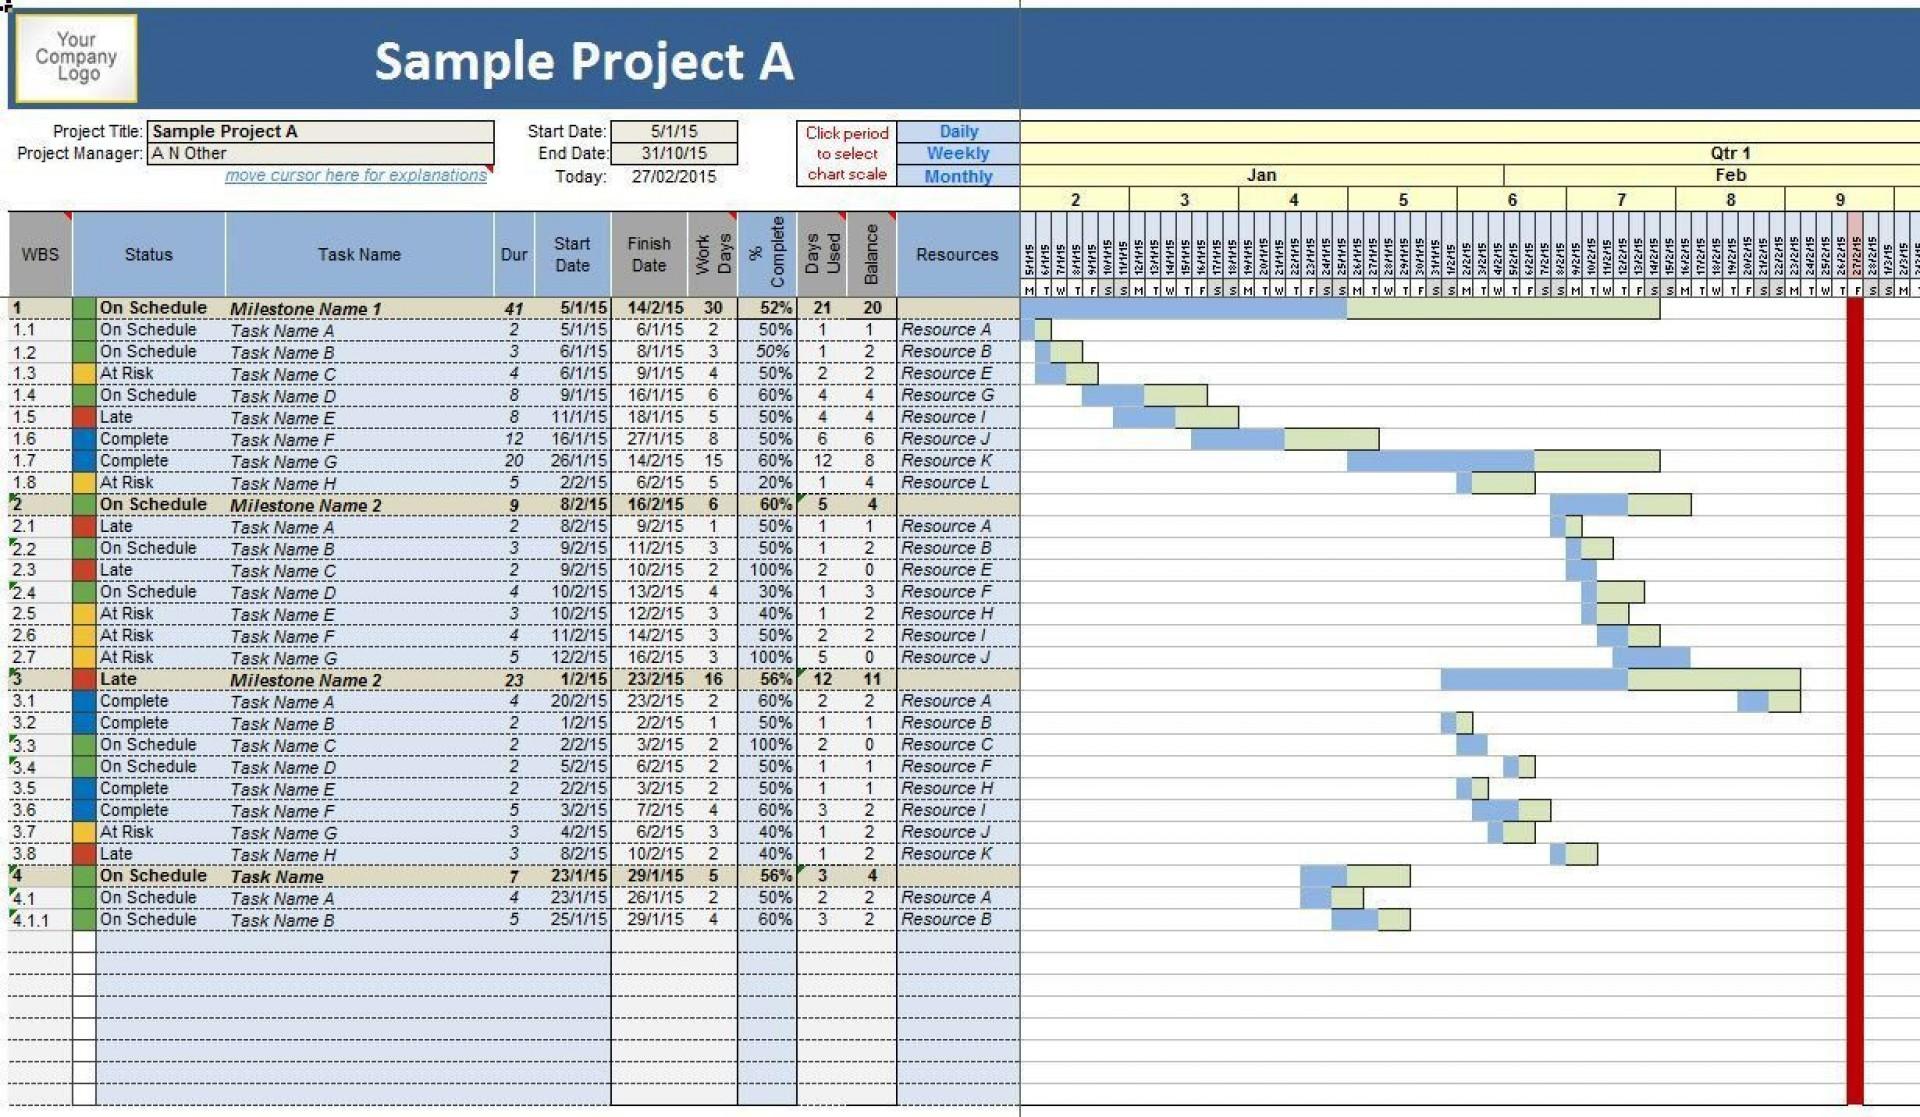 002 Sensational Excel Work Planner Template High Resolution  Microsoft Monthly Schedule Plan Scheduling1920